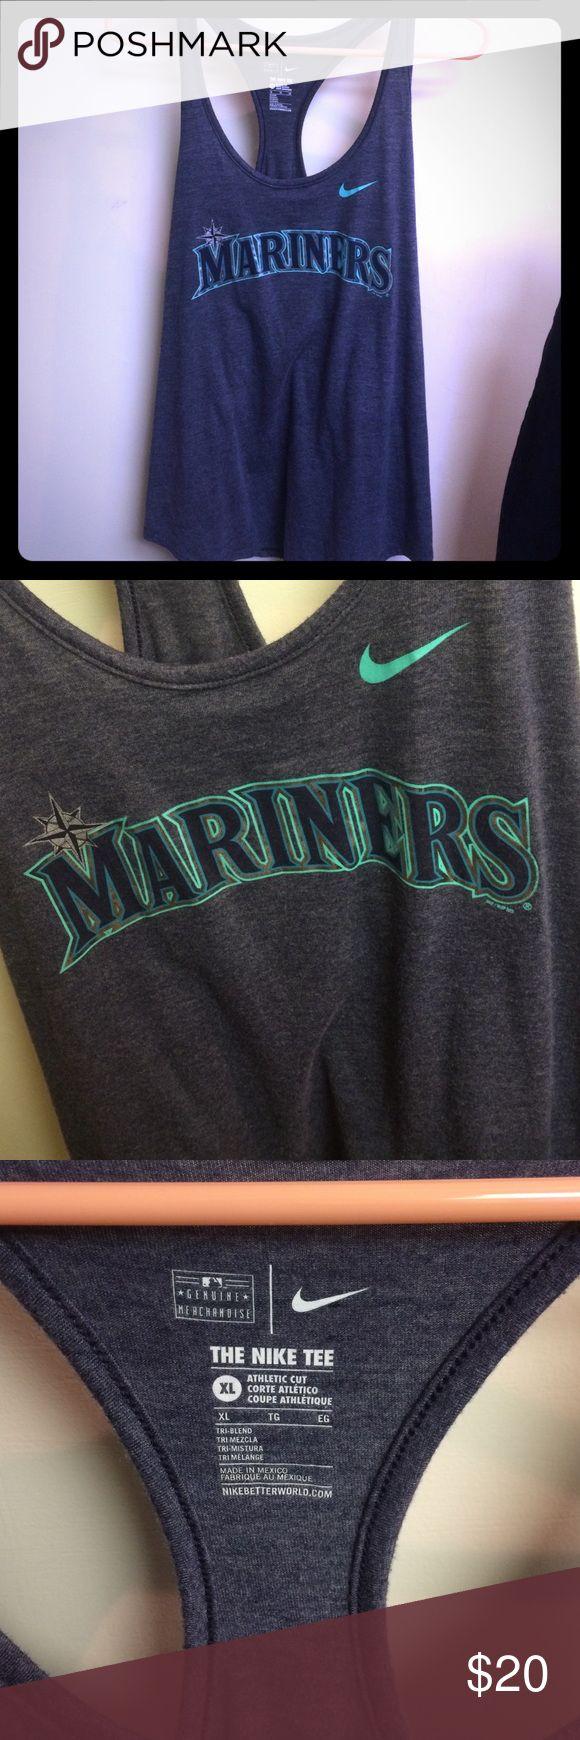 Blue nike Mariners tank top! Blue nike Mariners tank top! Only worn once super cute! Nike Tops Tank Tops